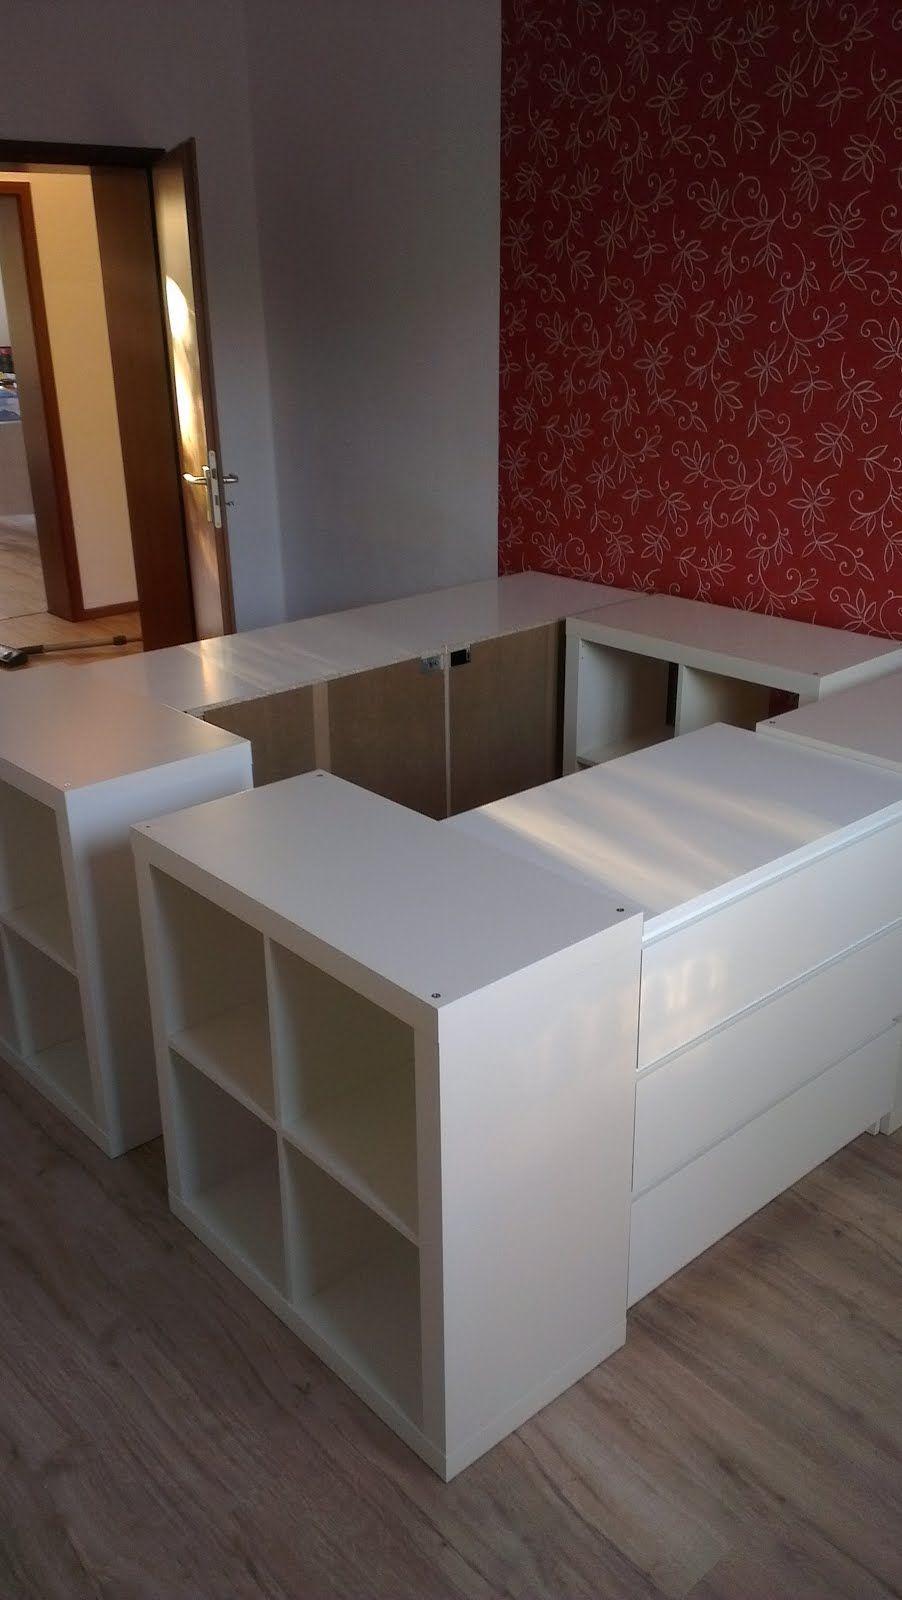 Half A Loft Bed Diy Home Decor Bett Mit Stauraum Ikea